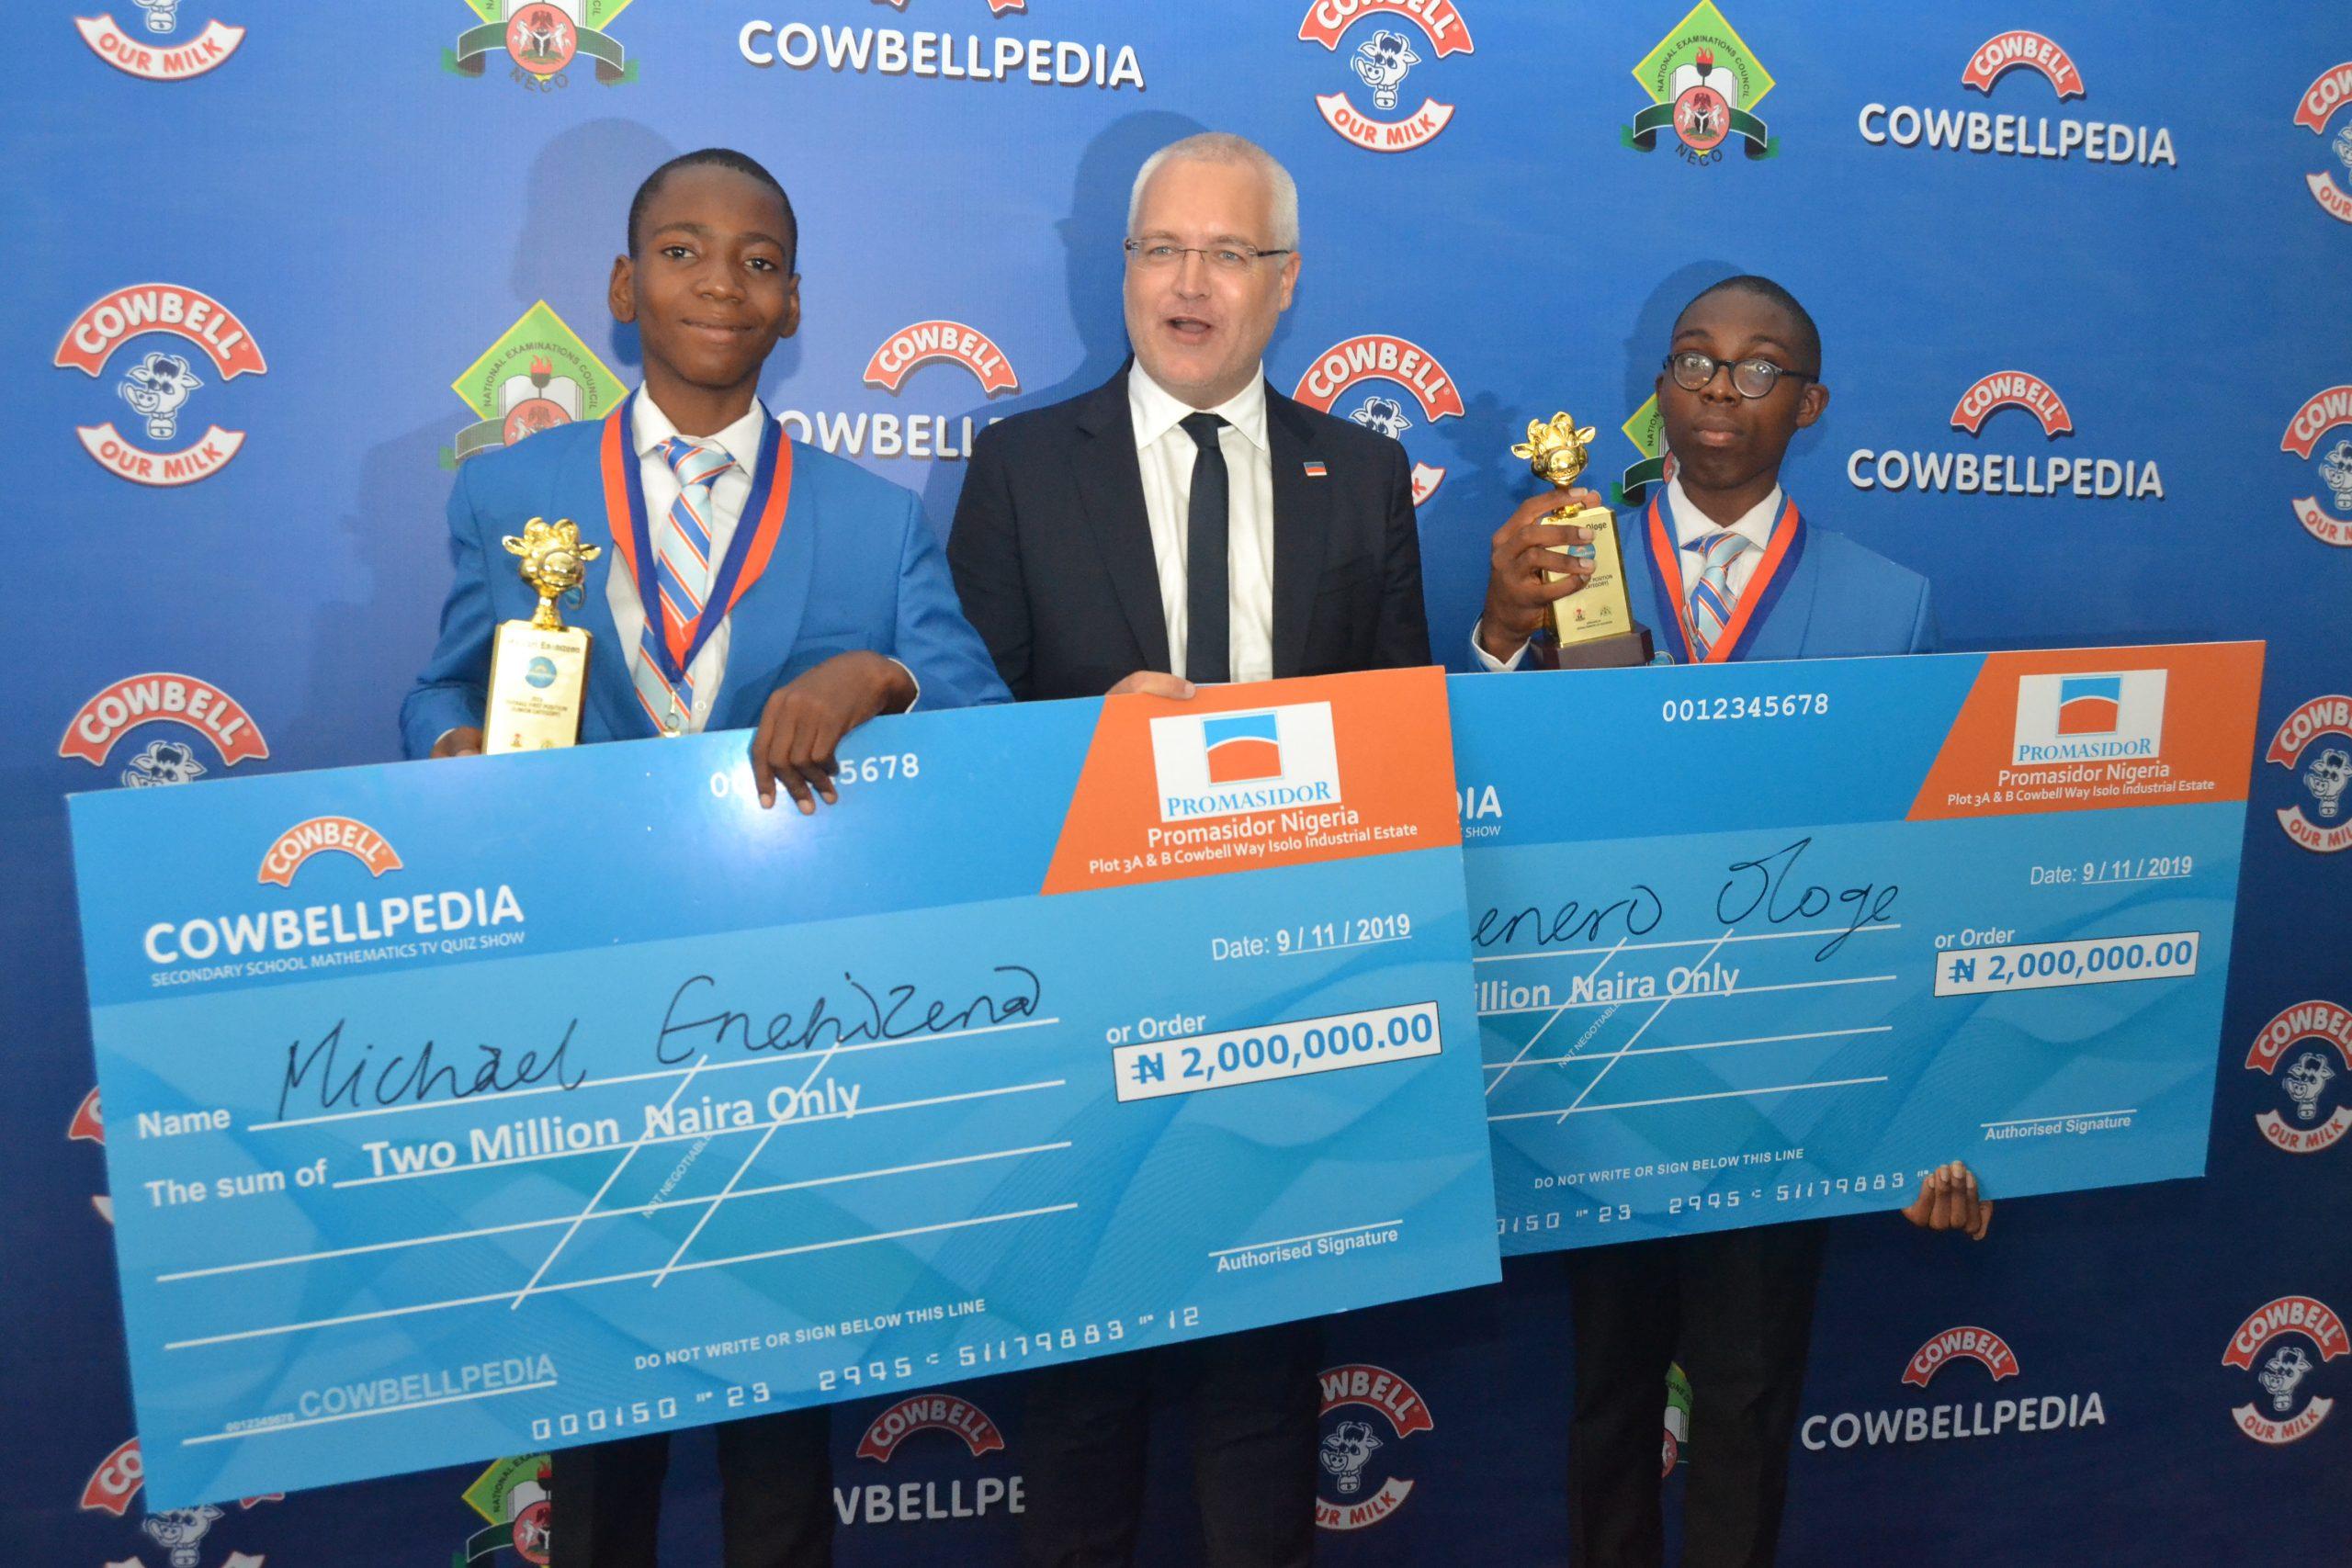 Lagos, Ogun Win 2019 Cowbellpedia Mathematics Competition